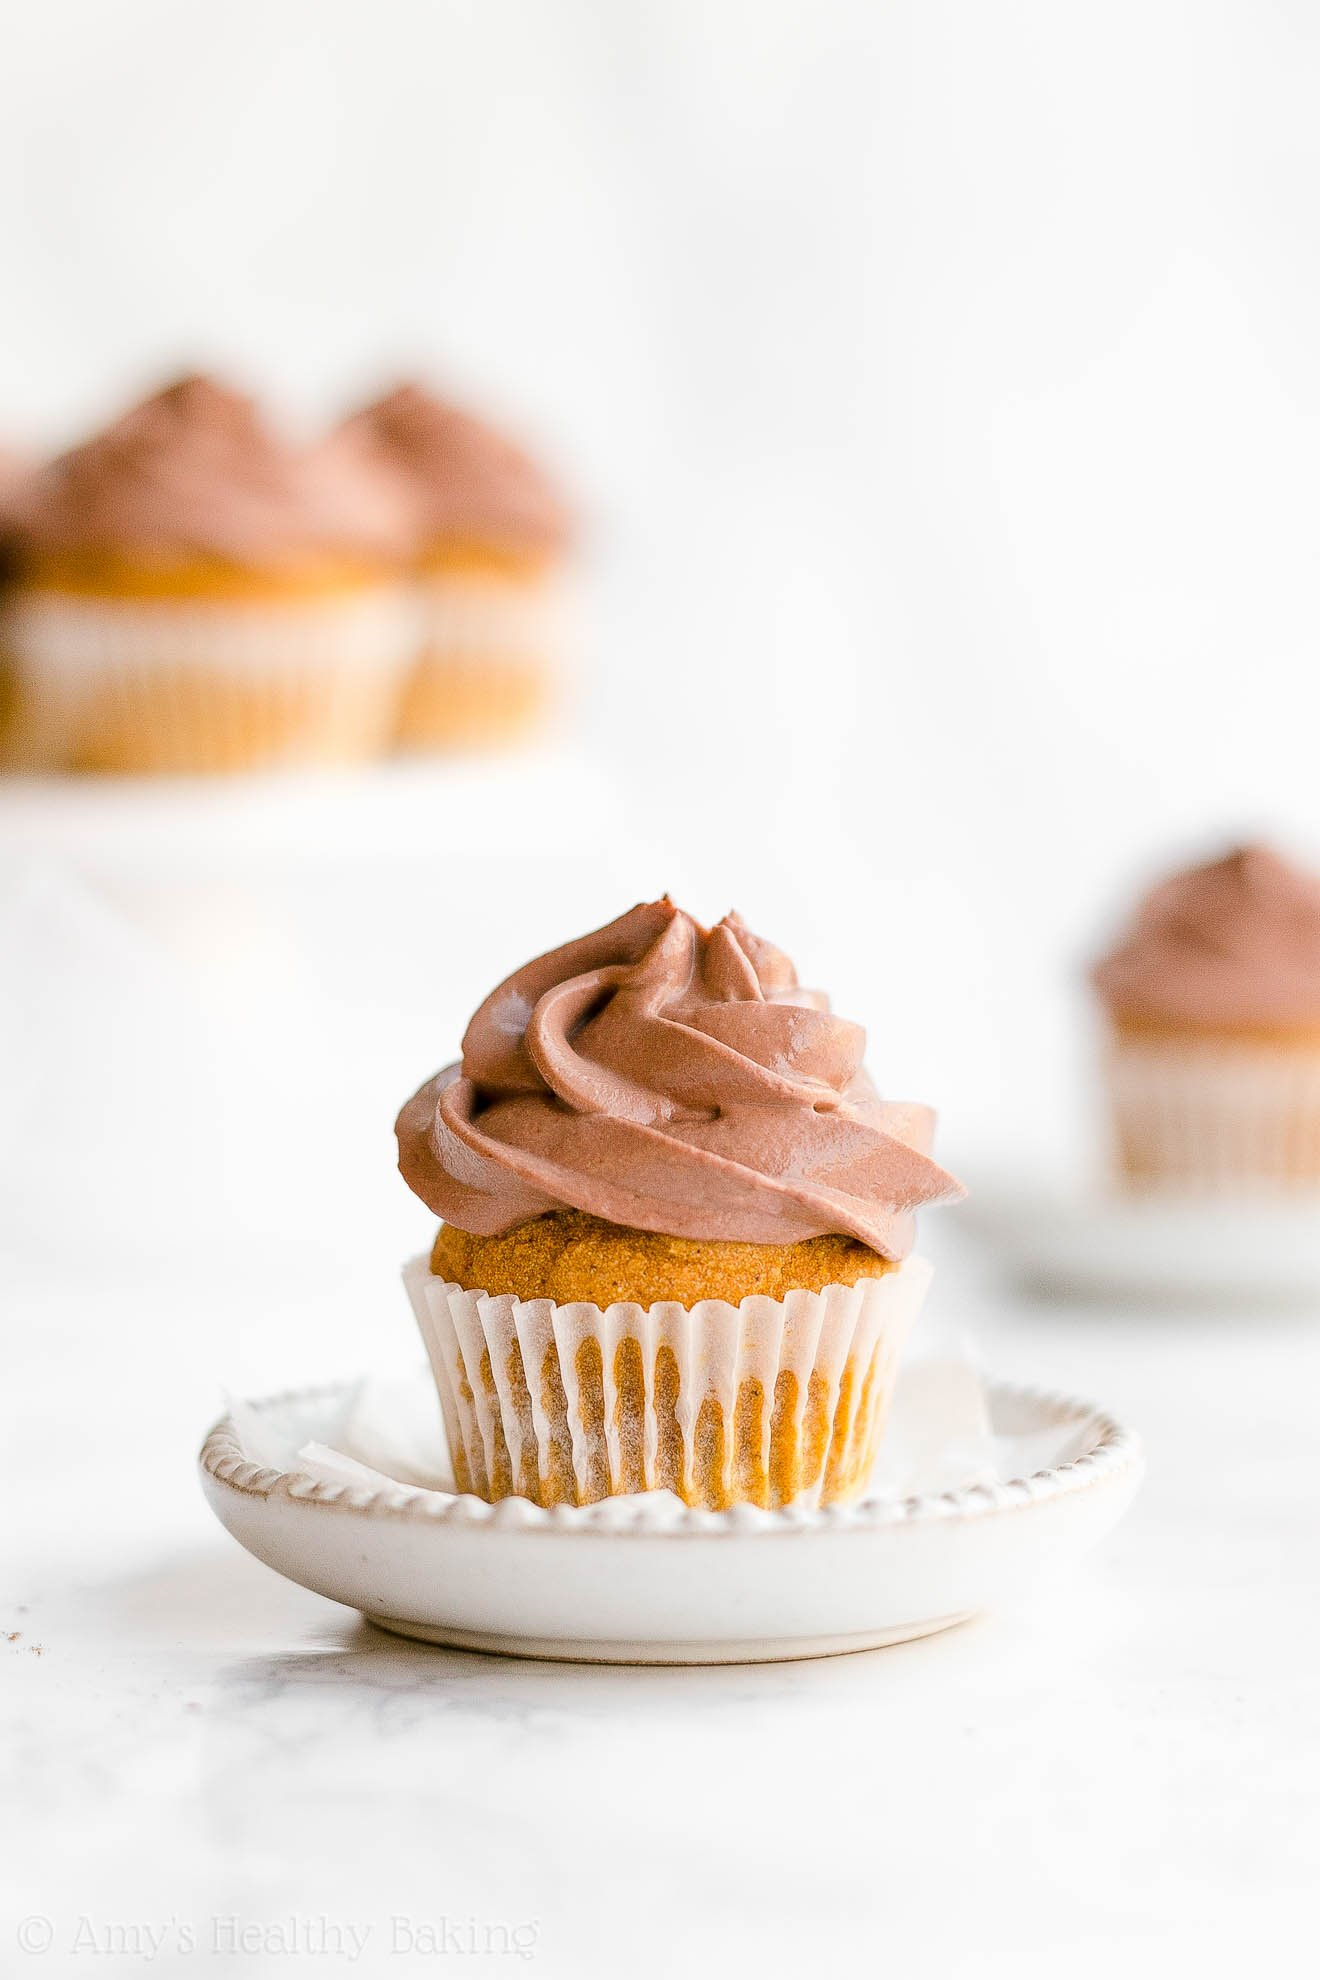 Healthy Small Batch Mini Pumpkin Cupcakes with Chocolate Greek Yogurt Frosting